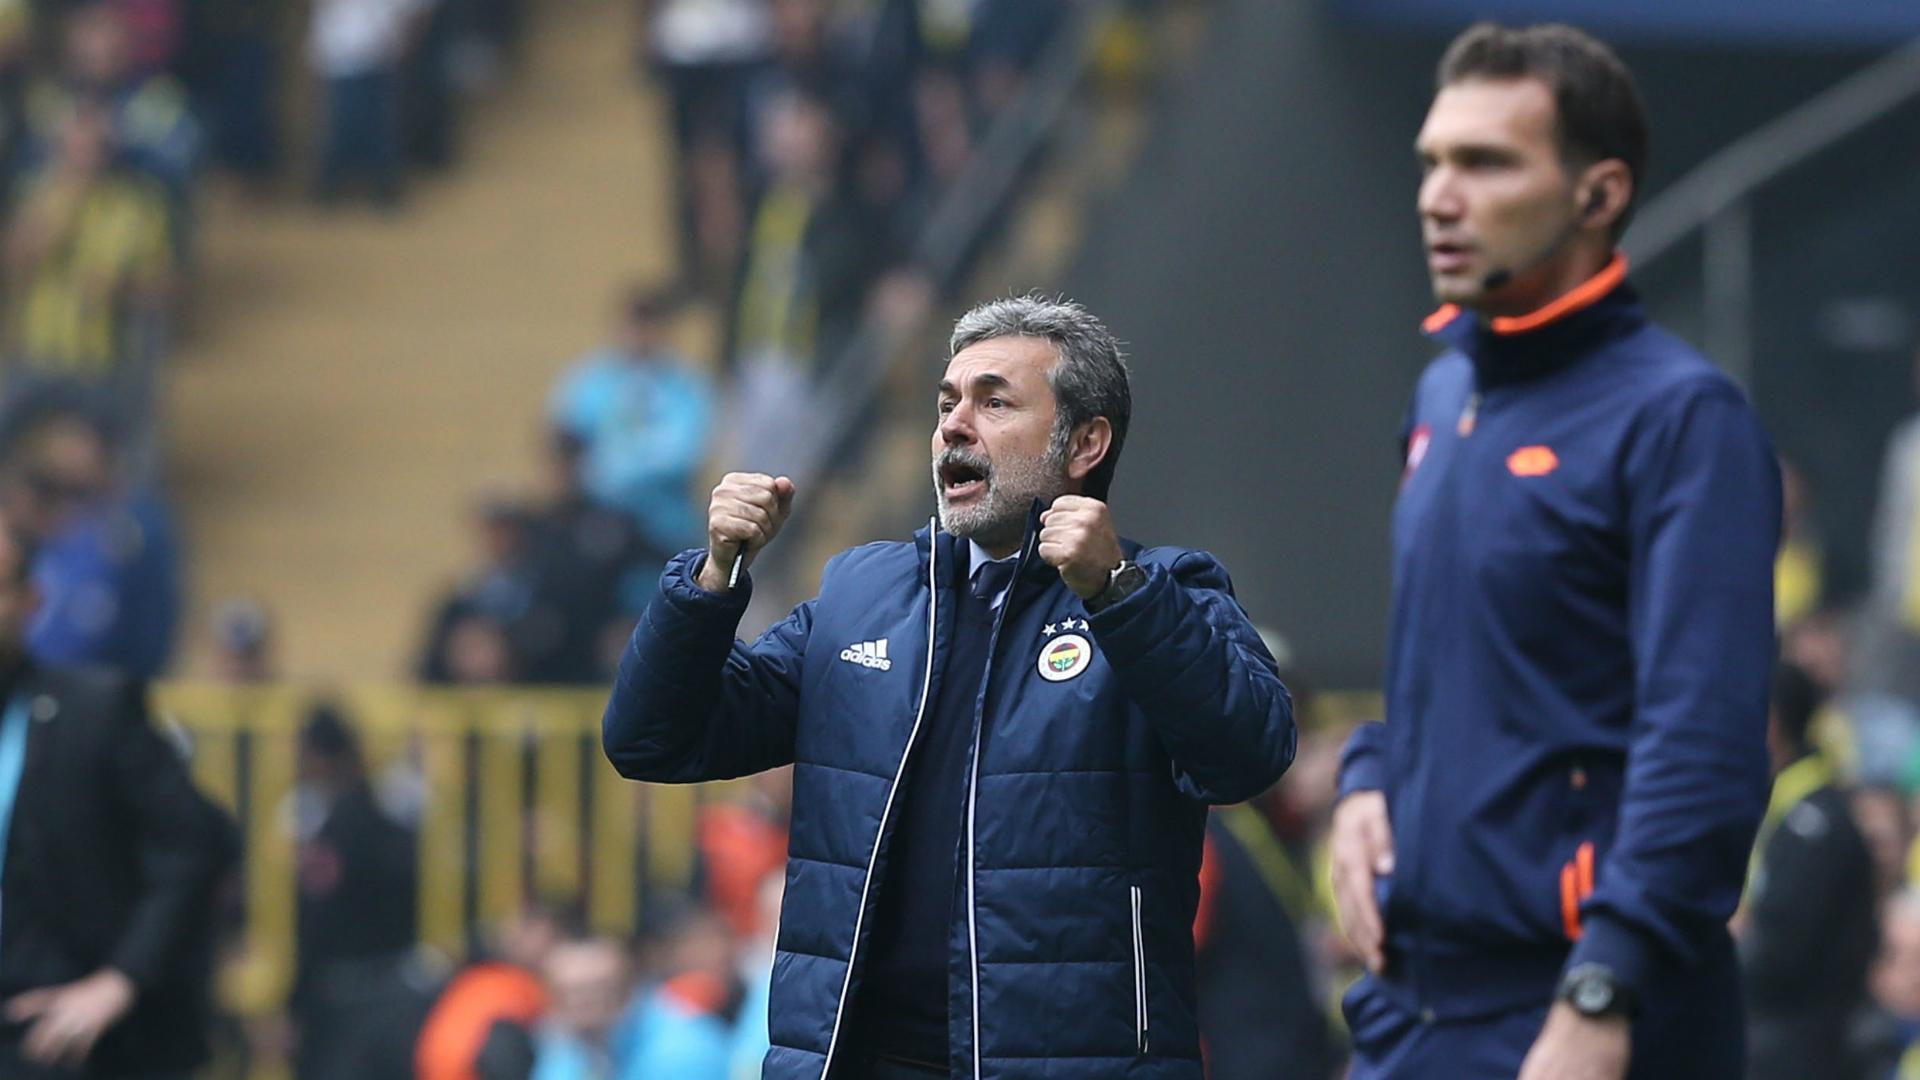 Bursaspor Fenerbahce 050618 Aykut Kocaman